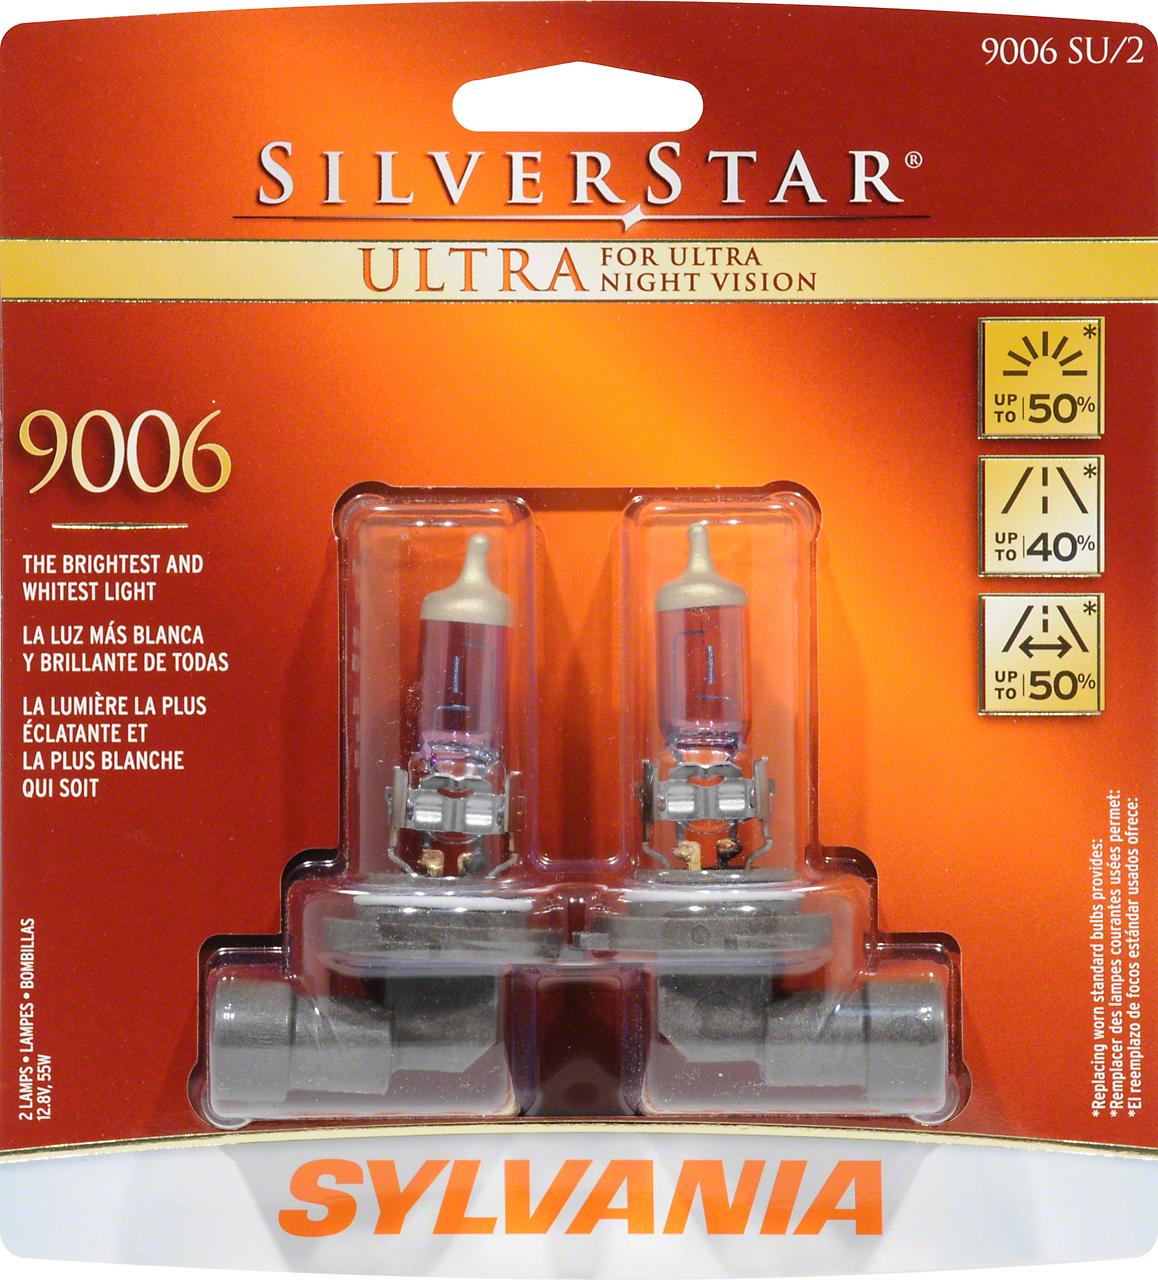 Sylvania Silverstar Ultra Light Bulbs - 9006